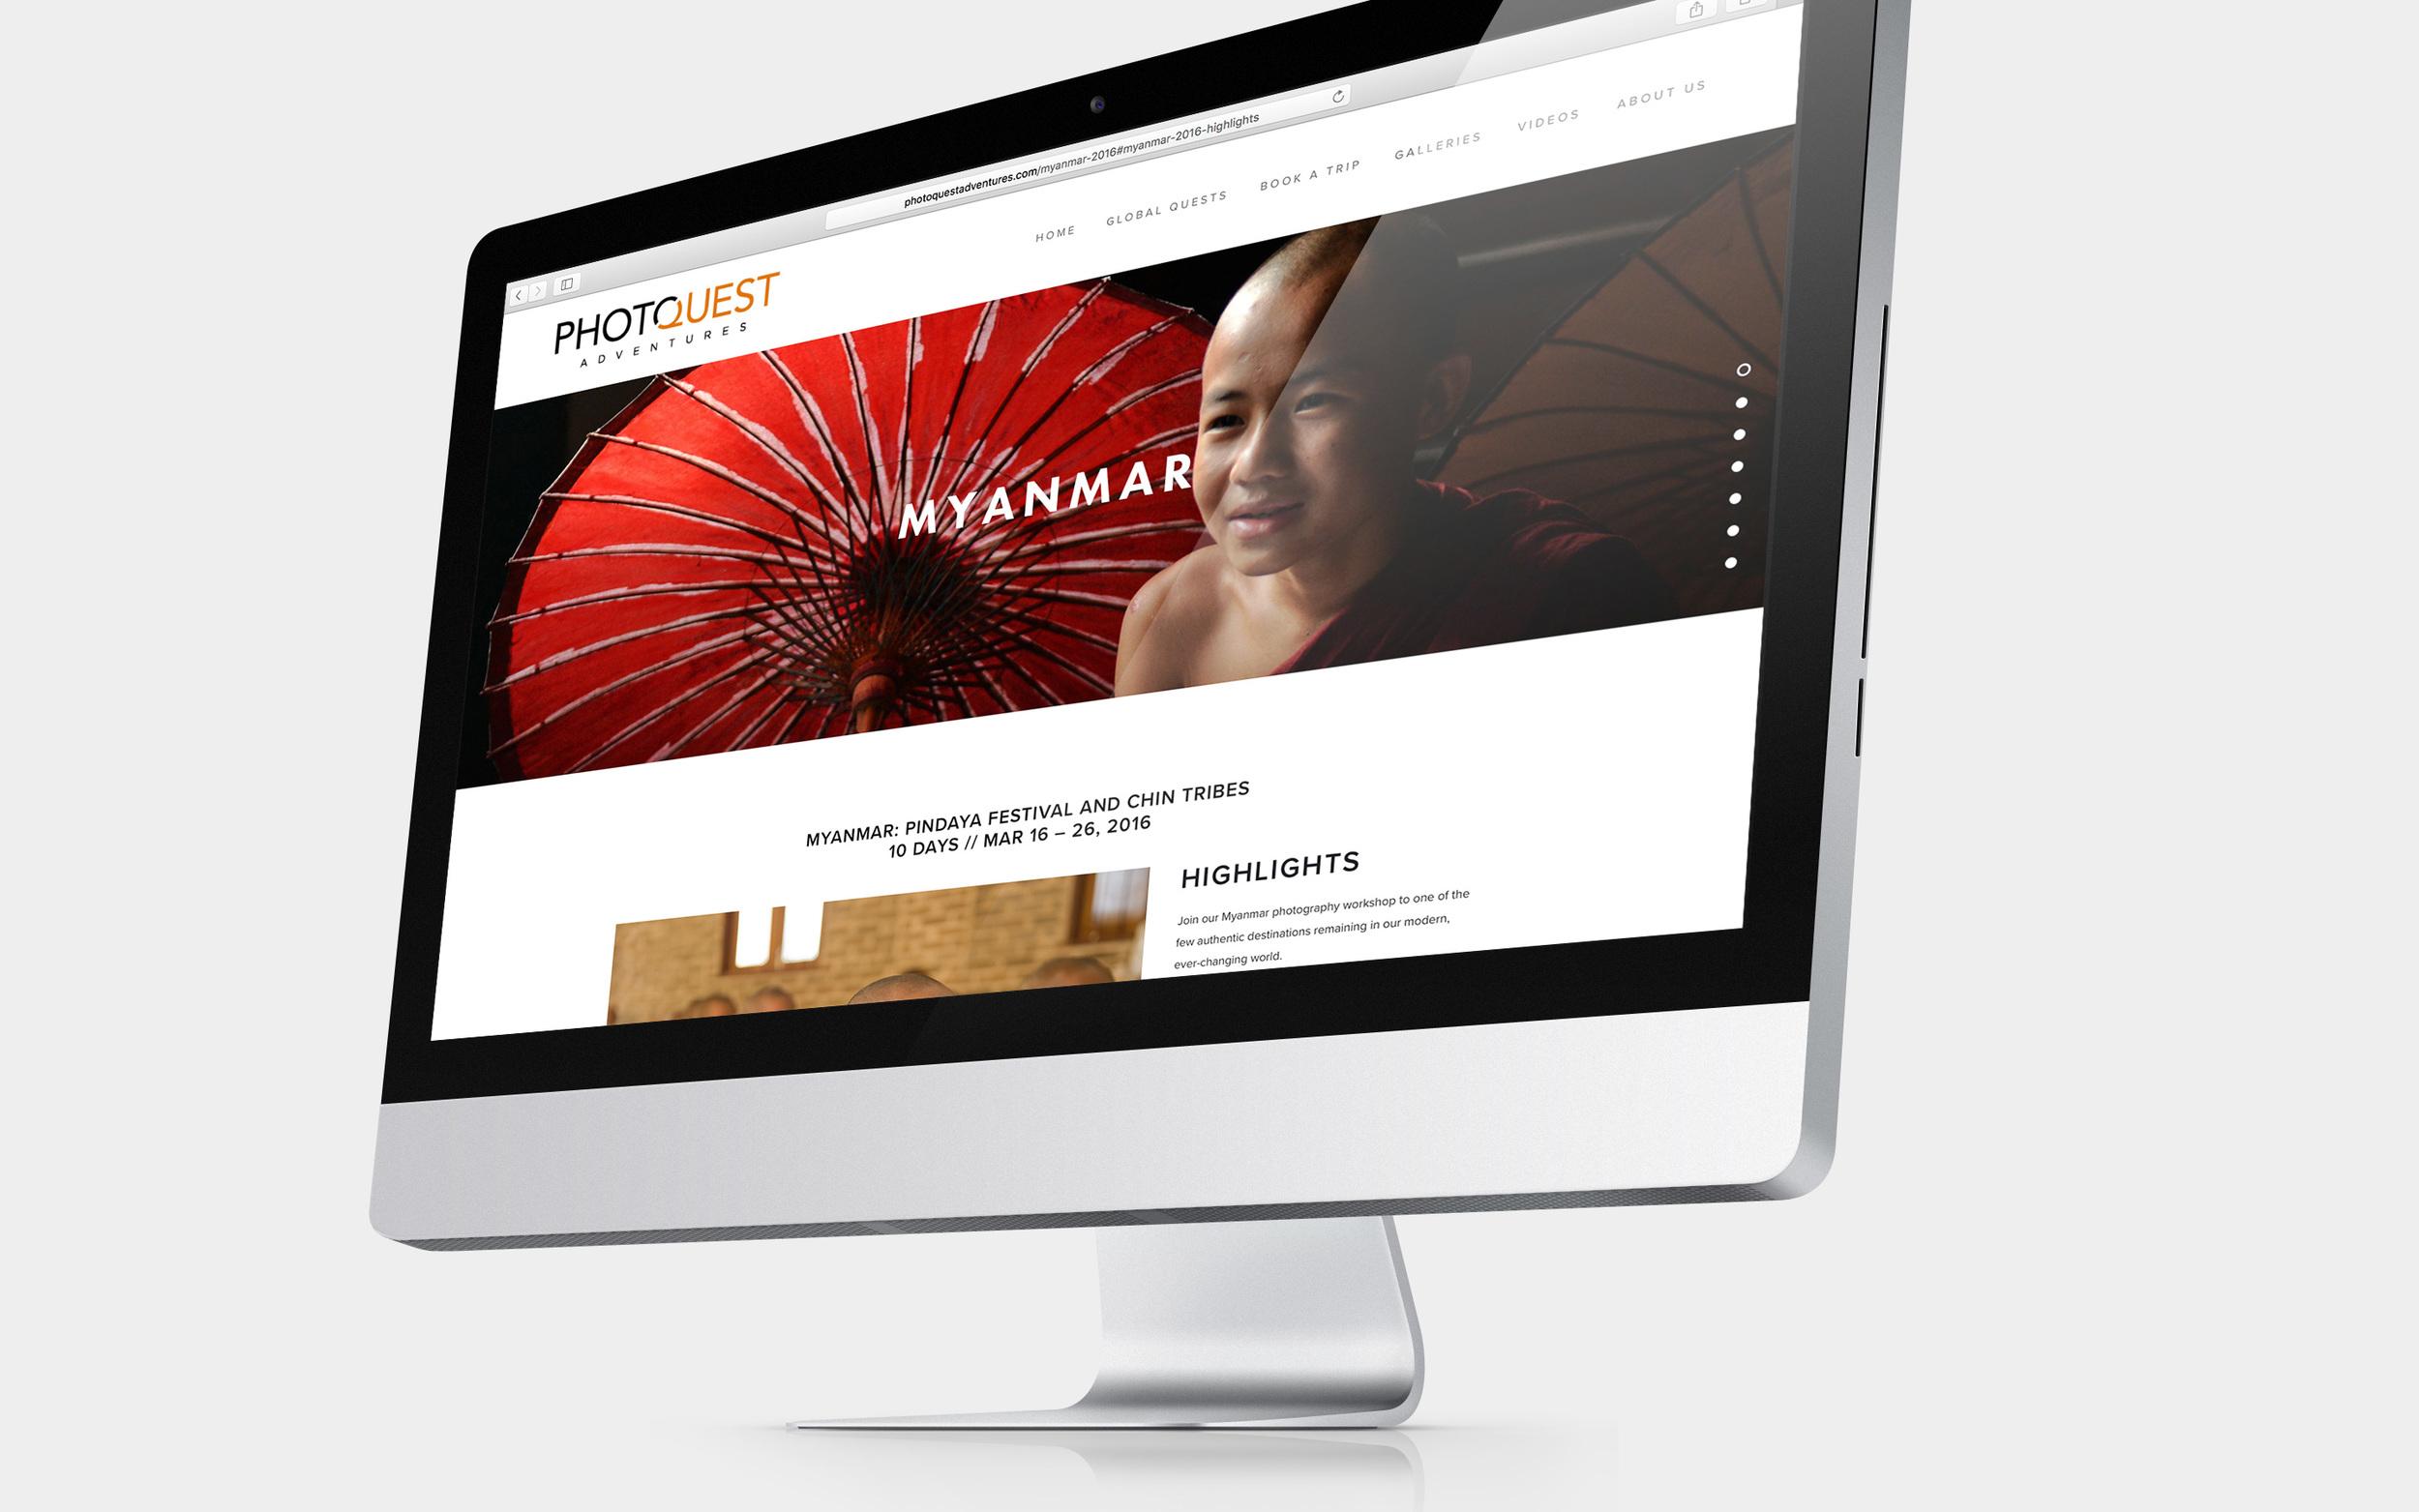 PhotoQuest website on iMac